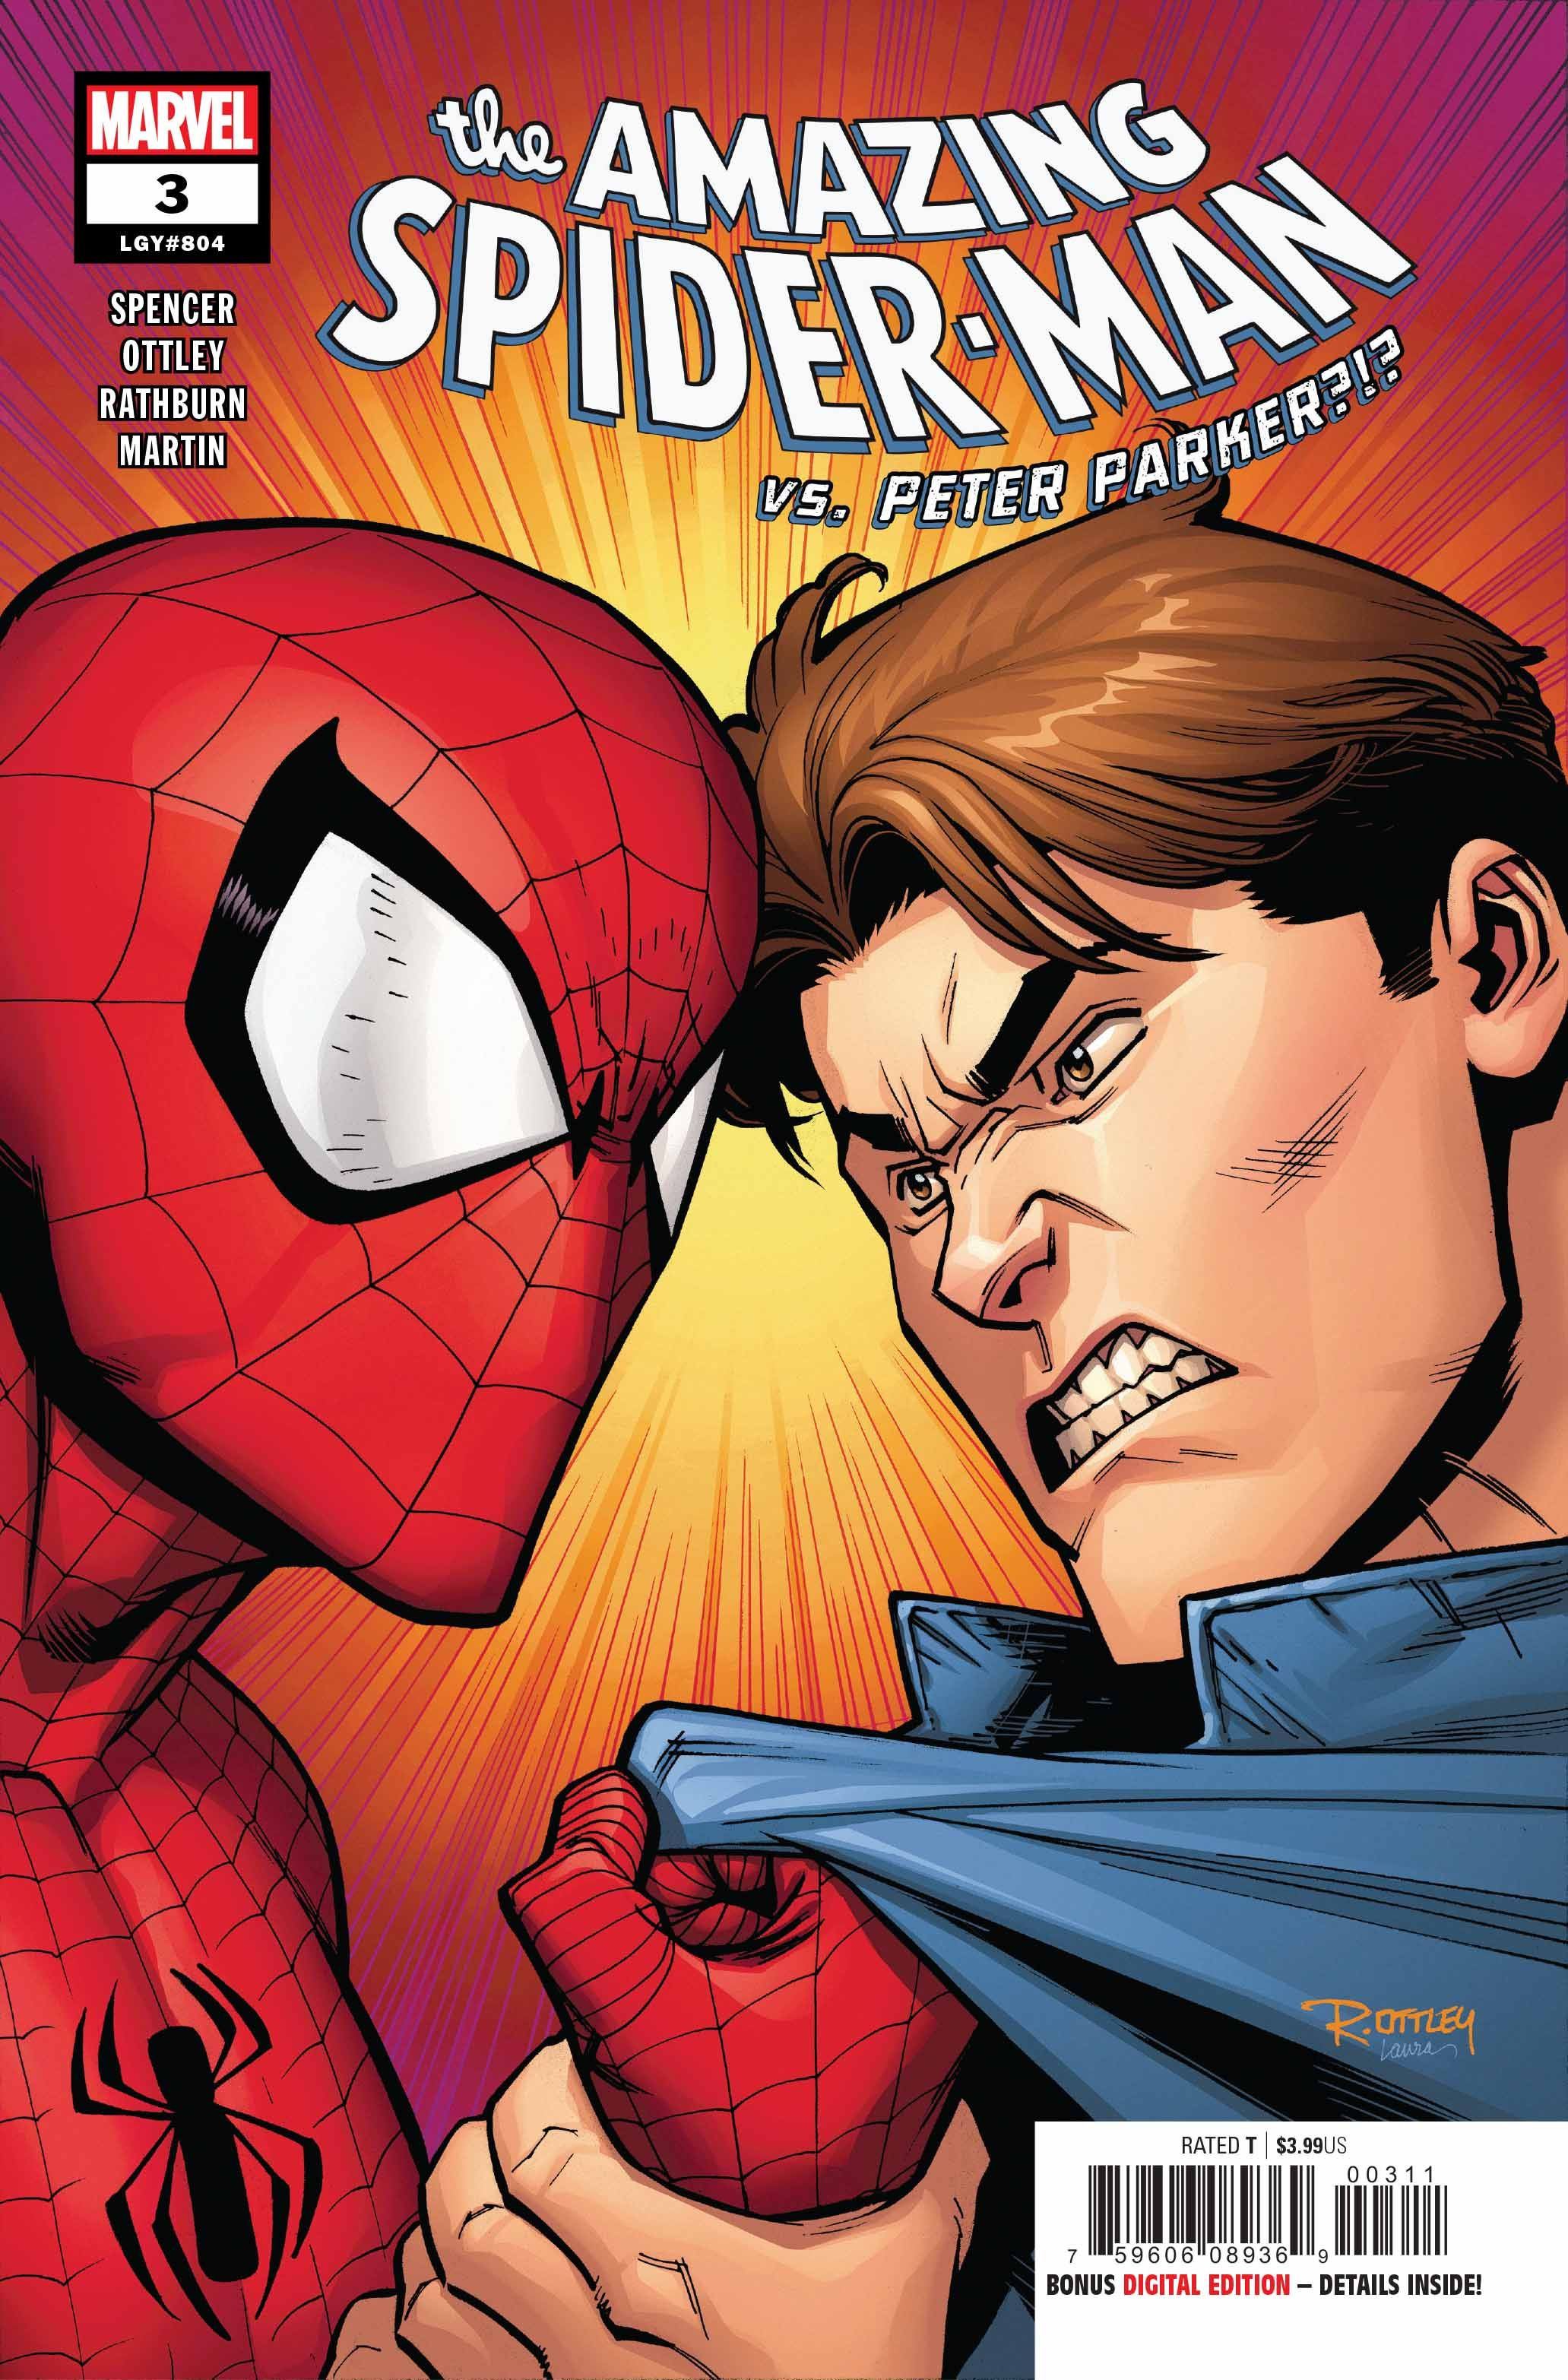 SC Marvel Comic PETER PARKER DER SPEKTAKULÄRE SPIDER-MAN 3